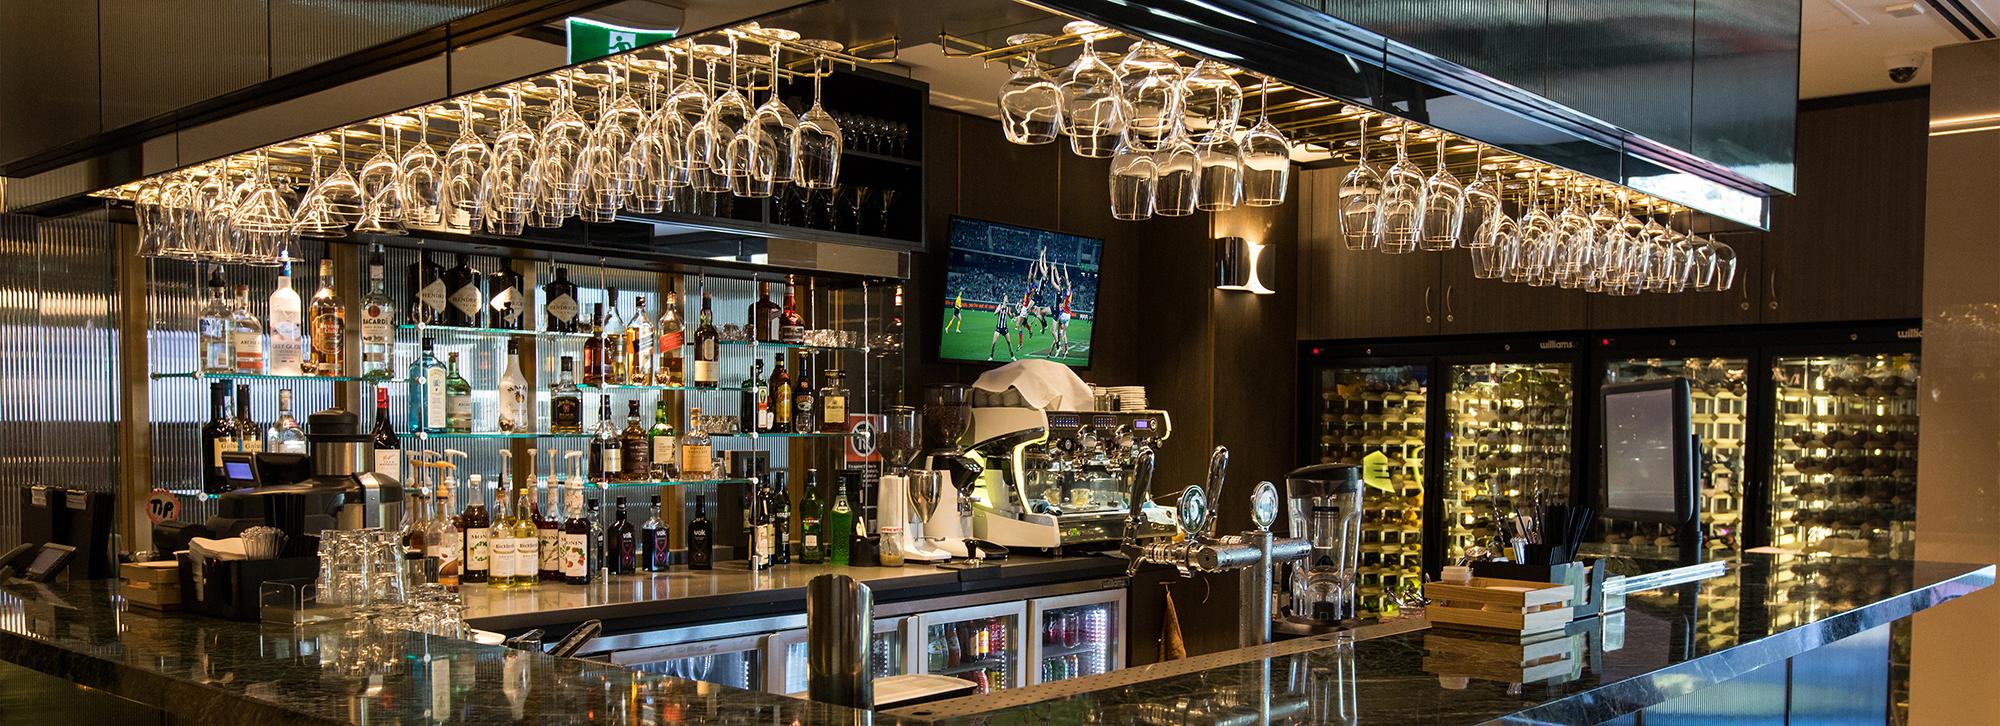 Nate's Bar